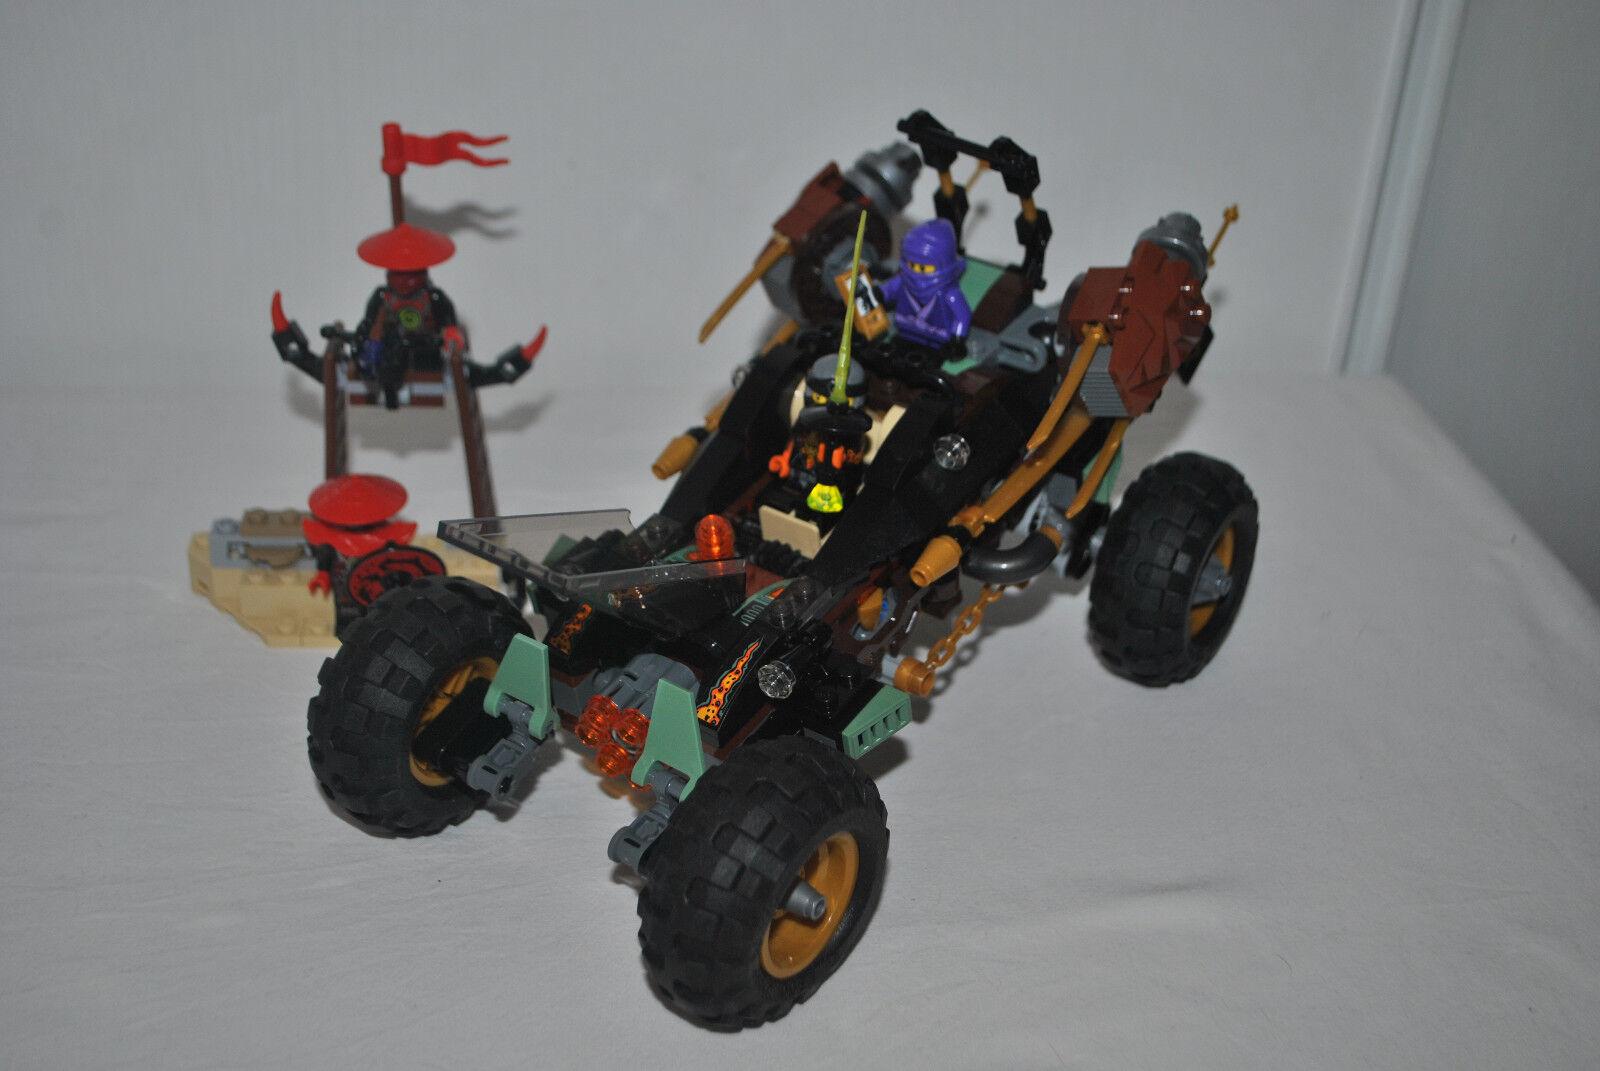 LEGO NINJAGO NINJAGO NINJAGO 70589 LE TOUT-TERRAIN DE COMBAT - COMPLET AVEC NOTICES ET BOITE dbc4b9